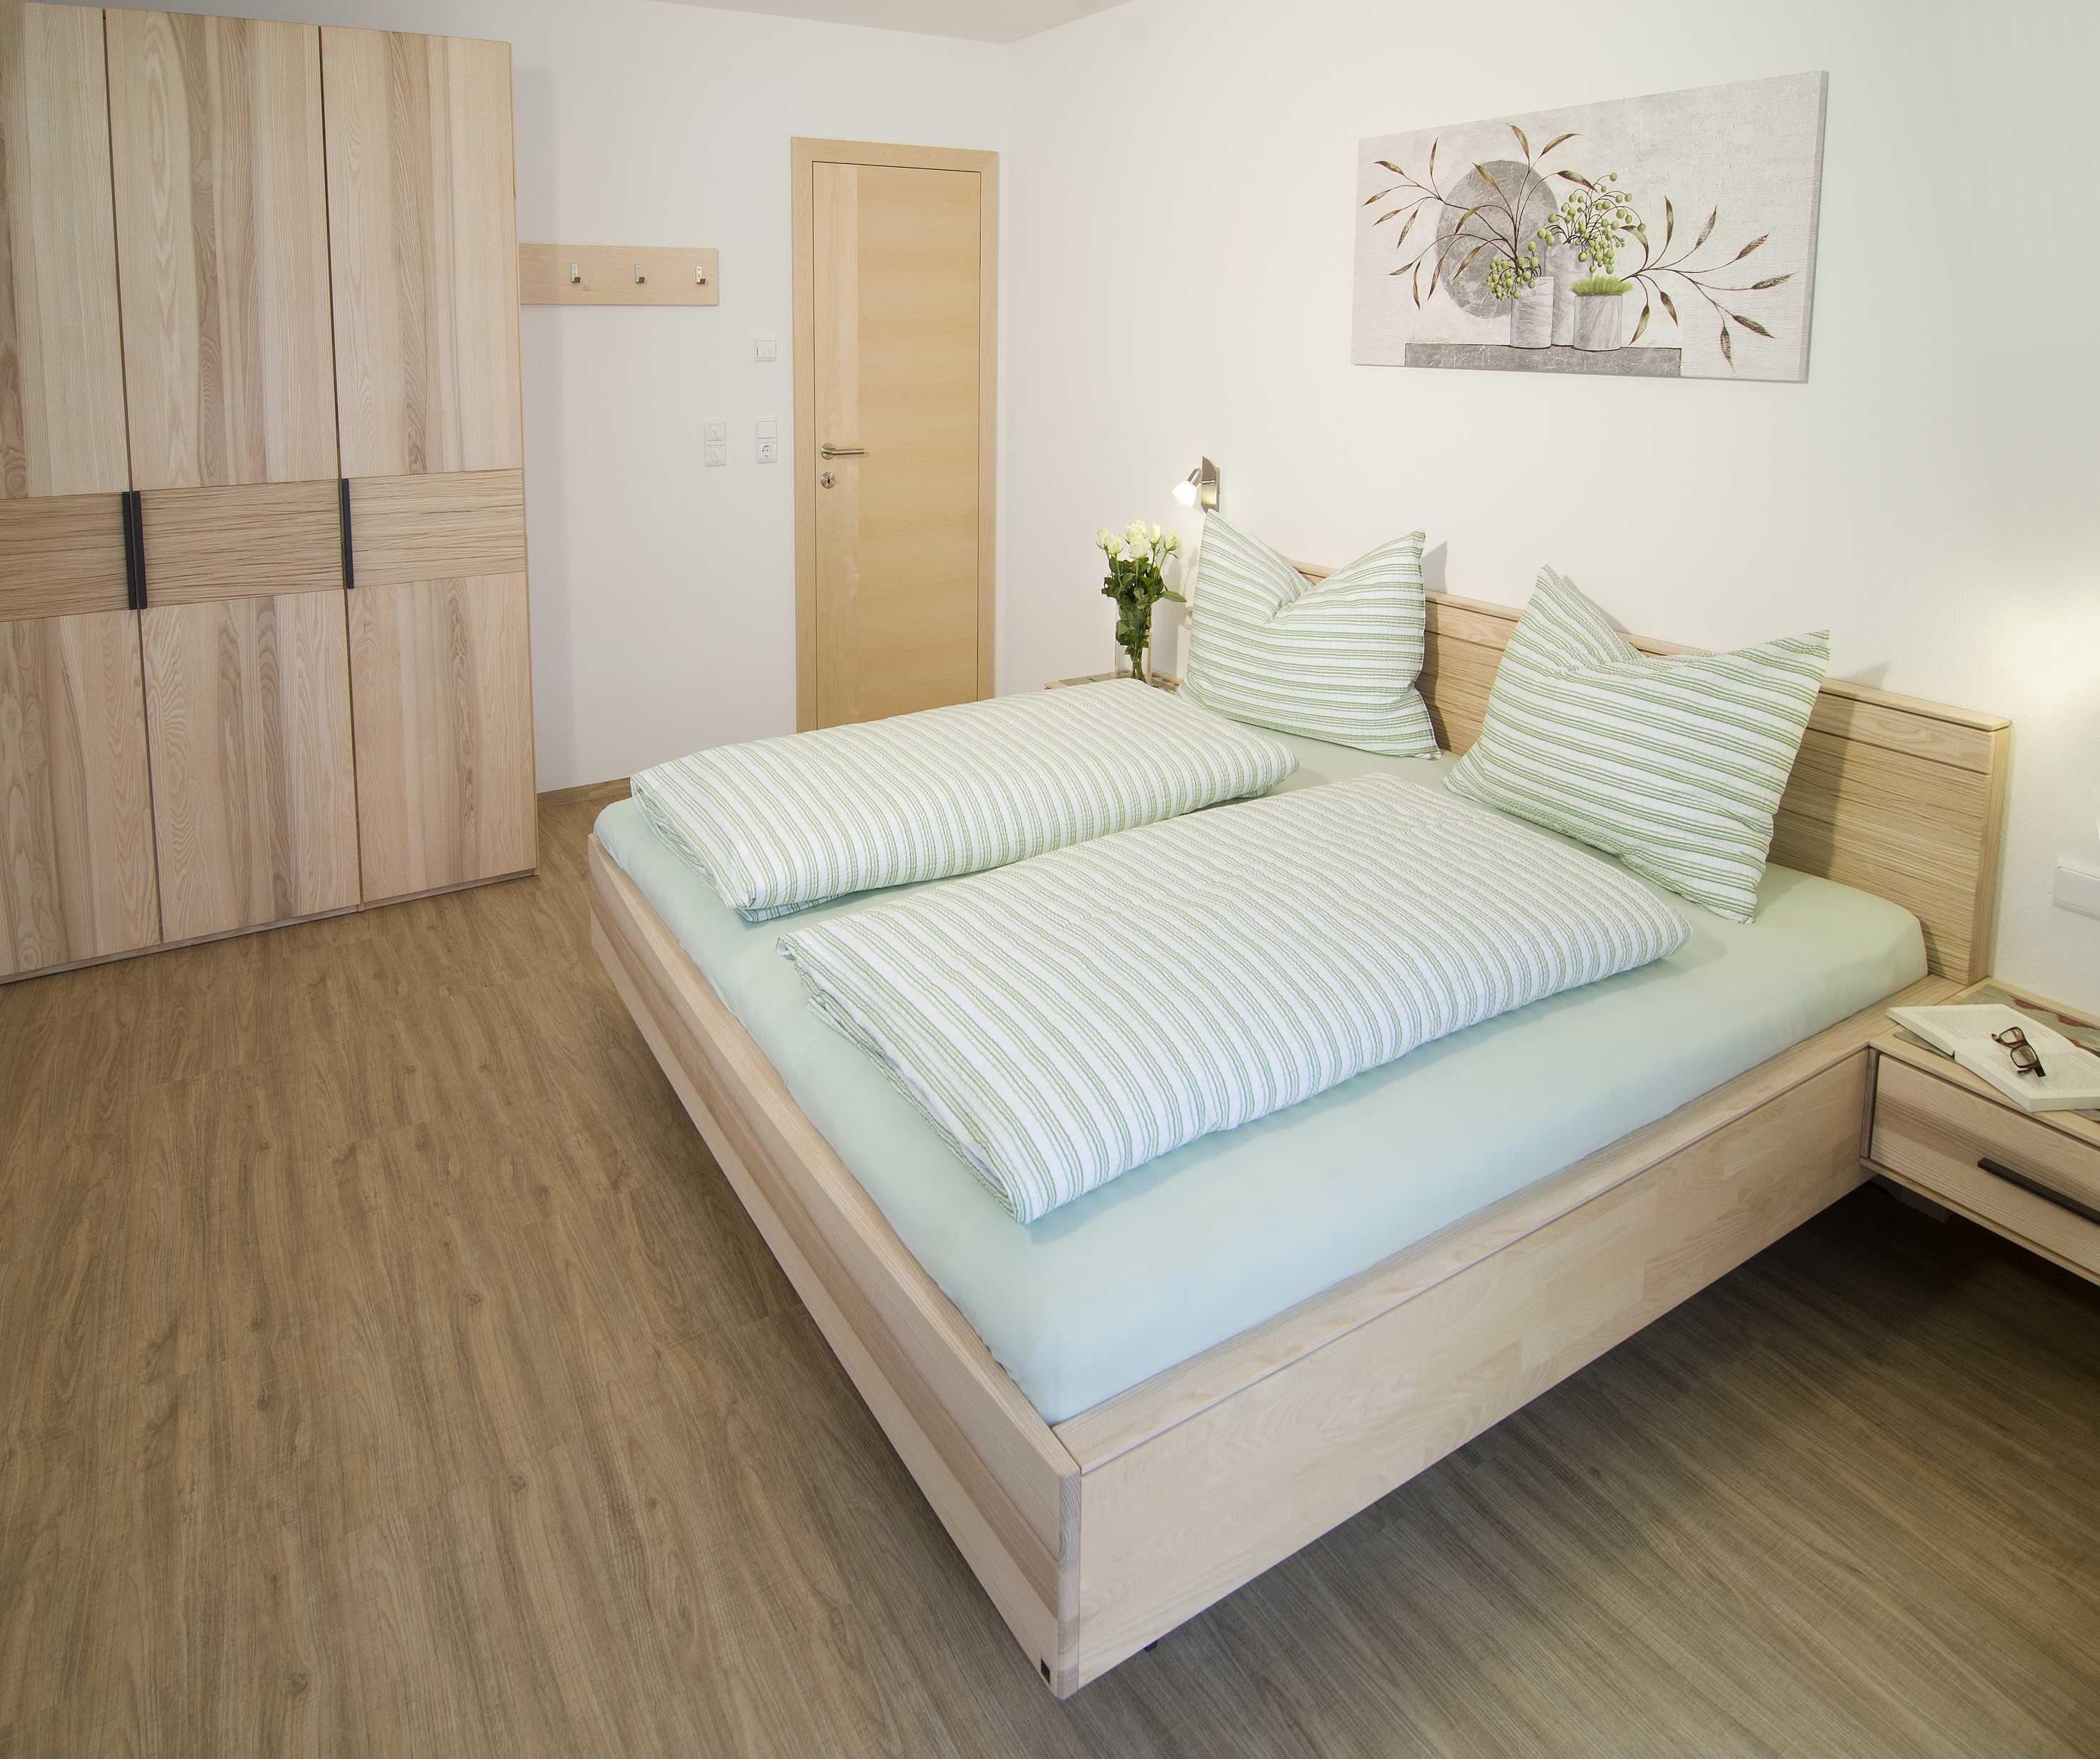 doppelbett dansk. Black Bedroom Furniture Sets. Home Design Ideas